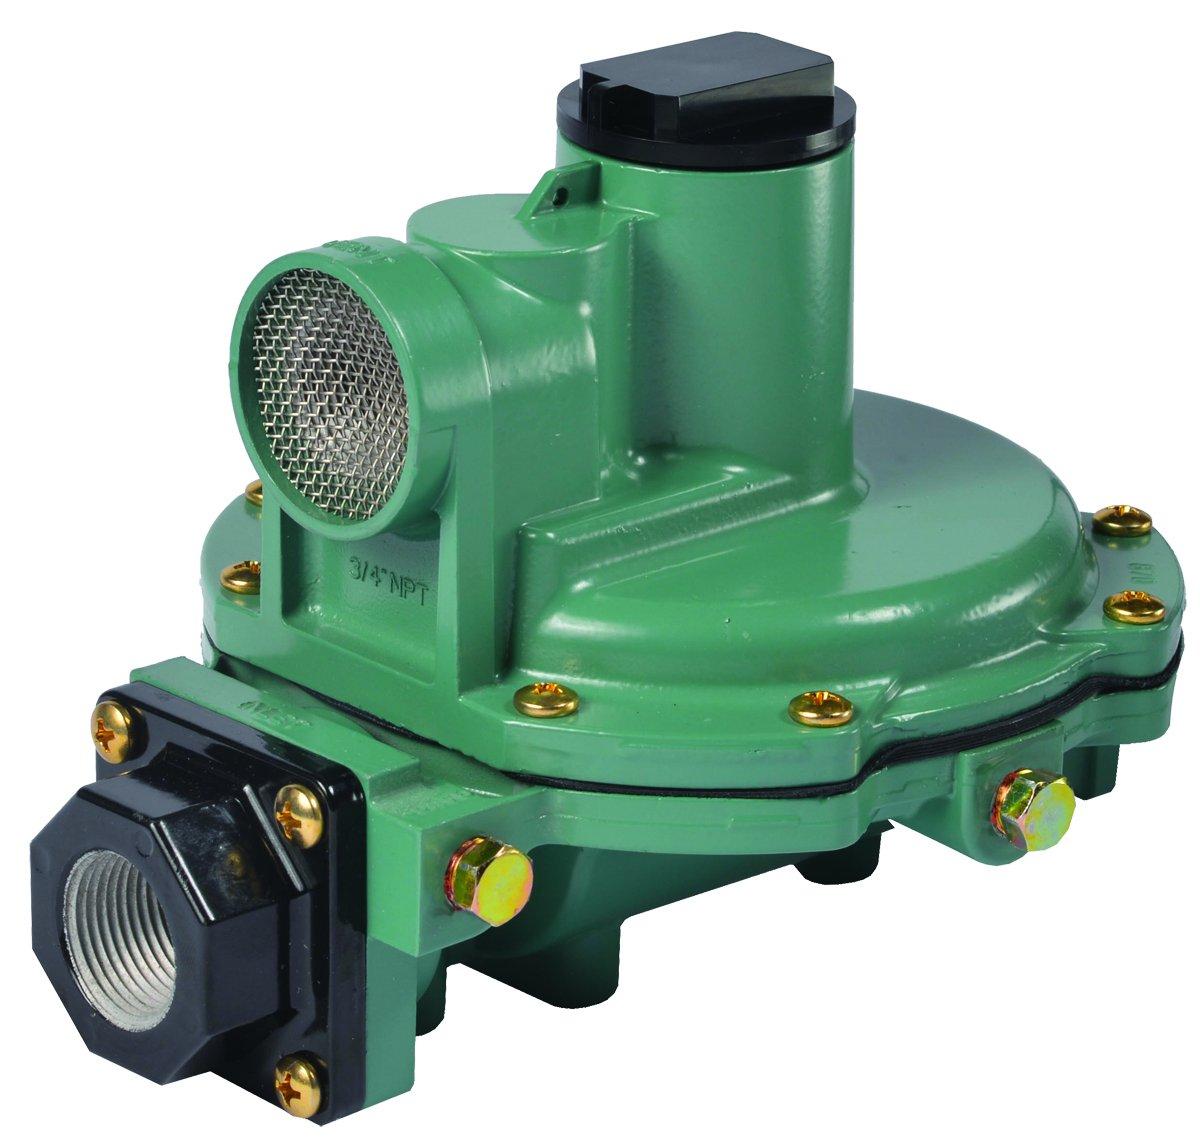 Emerson-Fisher LP-Gas Equipment R622-BCF 2nd Stage Regulator, 9-13'' W.C Spring, 1/2'' x 1/2'' NPT